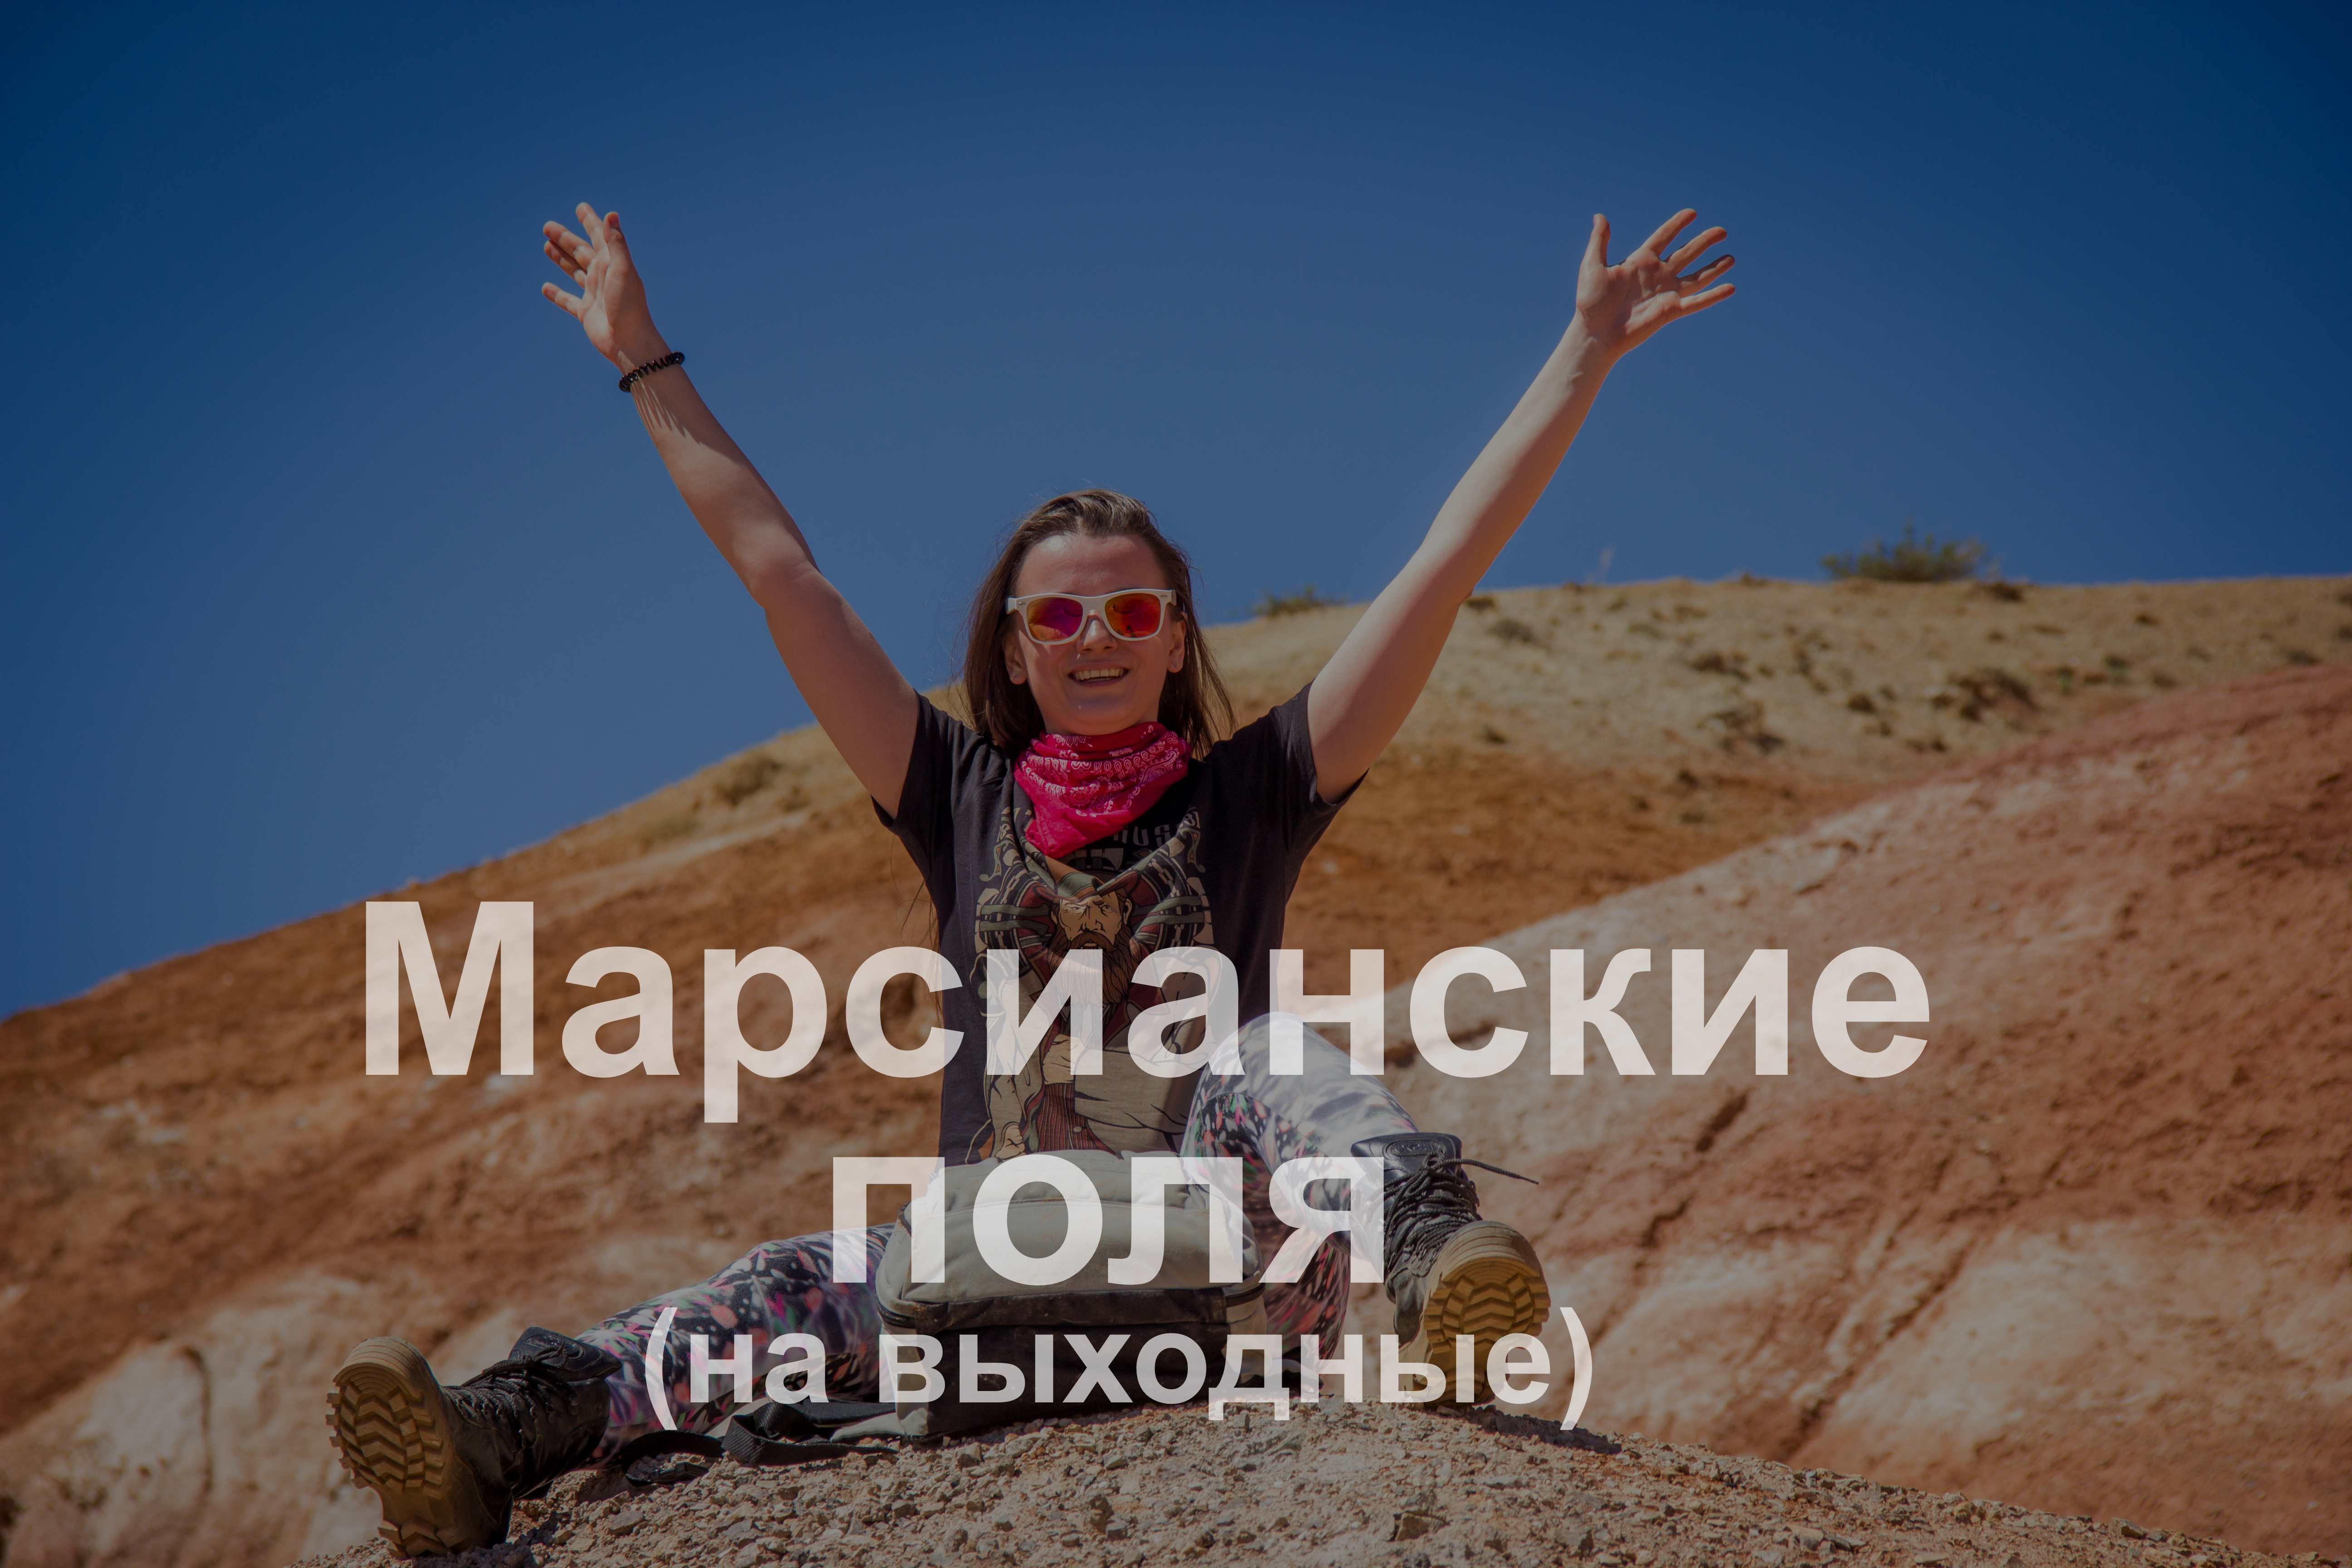 Марсианские горы Кызыл - Чин